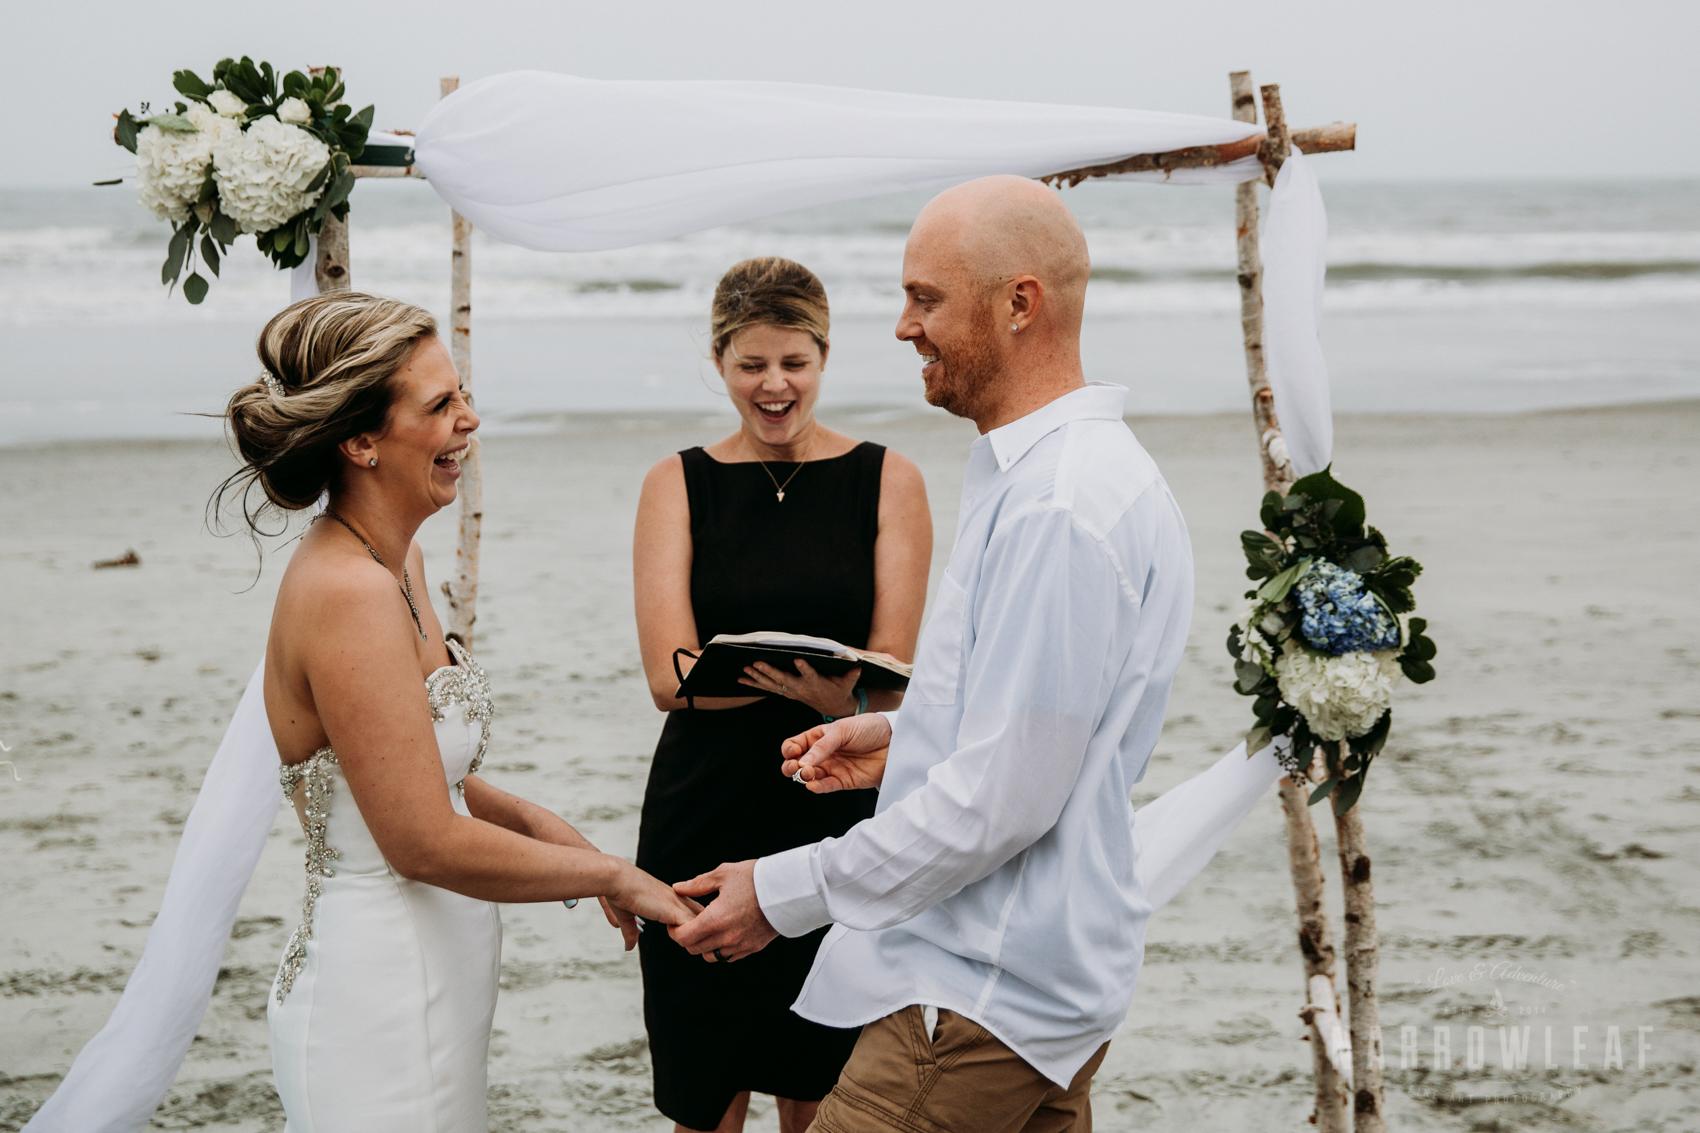 south-carolina-folly-beach-destination-wedding-NarrowLeaf_Love_&_Adventure_Photography-2319.jpg